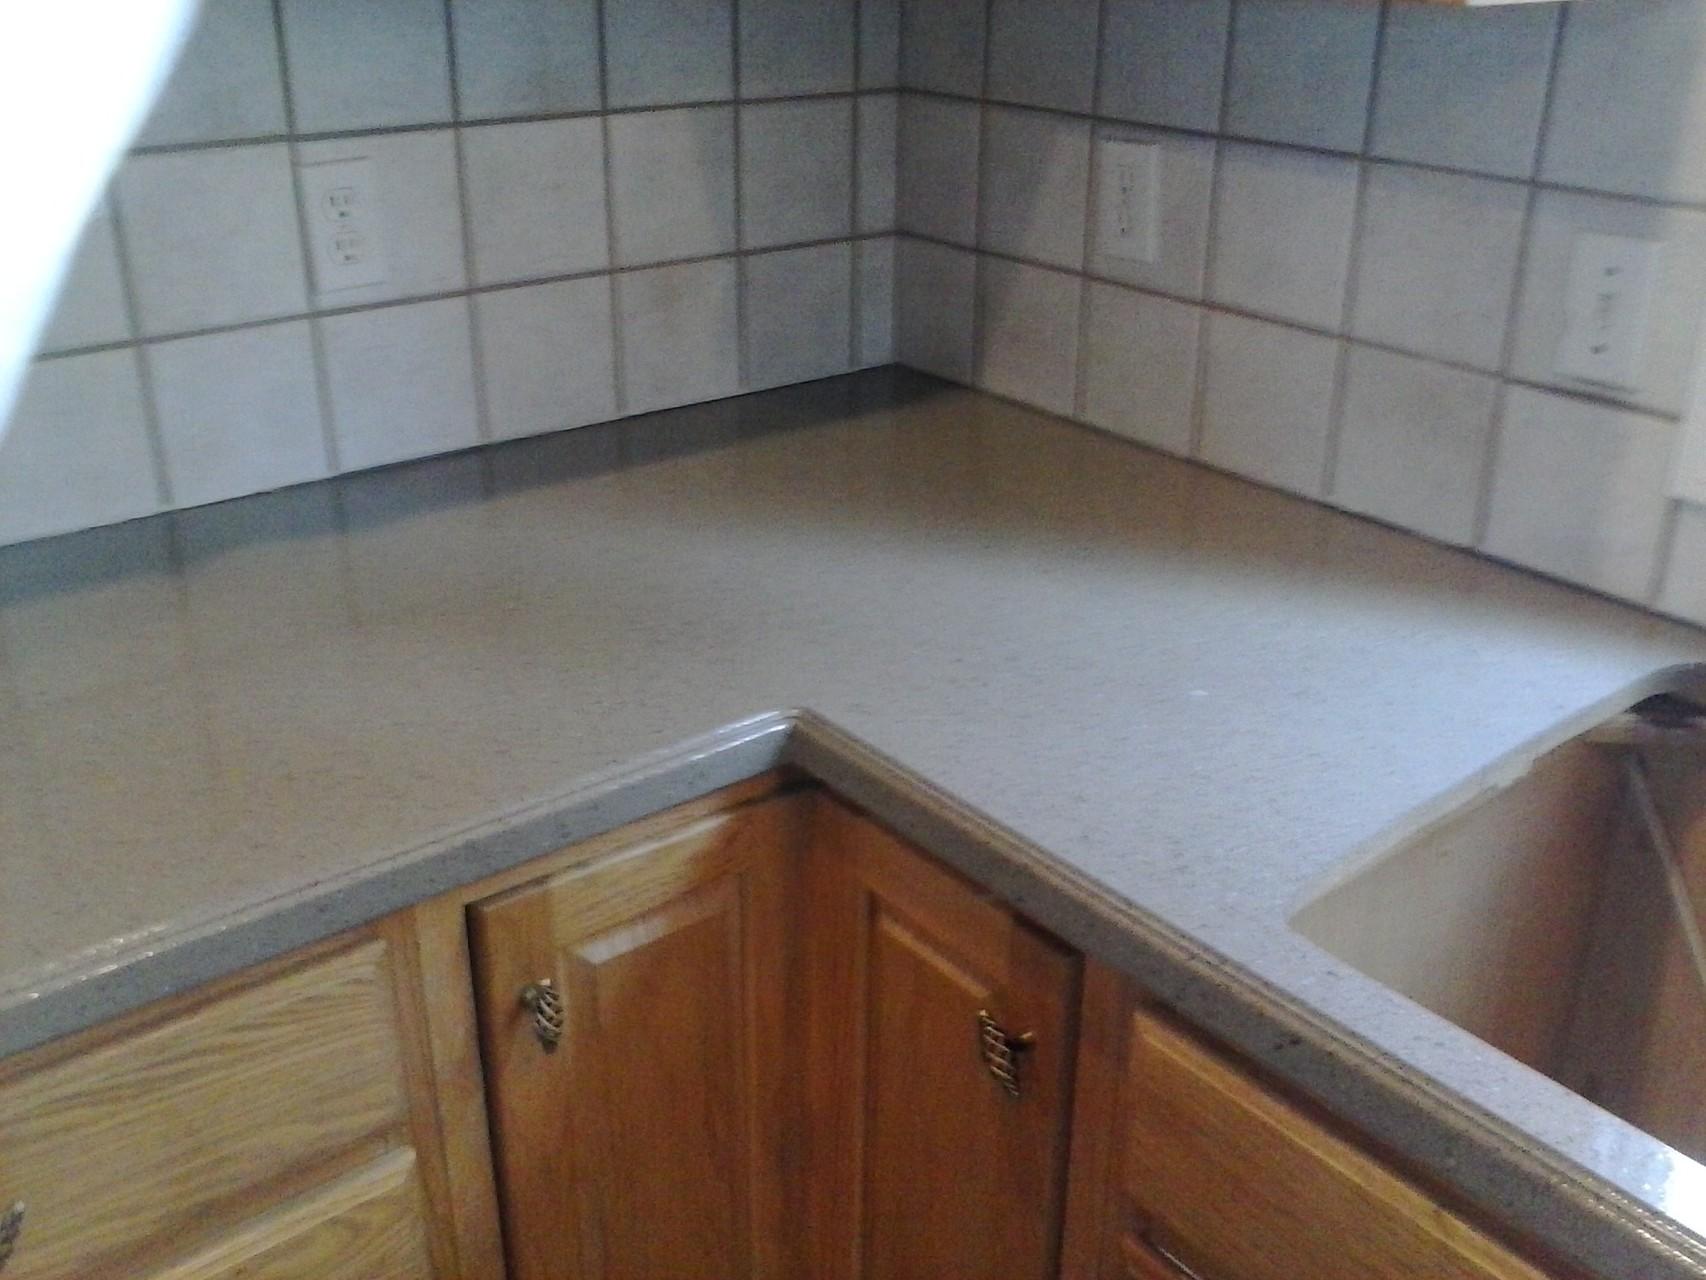 Countertop Resurfacing Dennies Resurfacing Tub Amp Tile